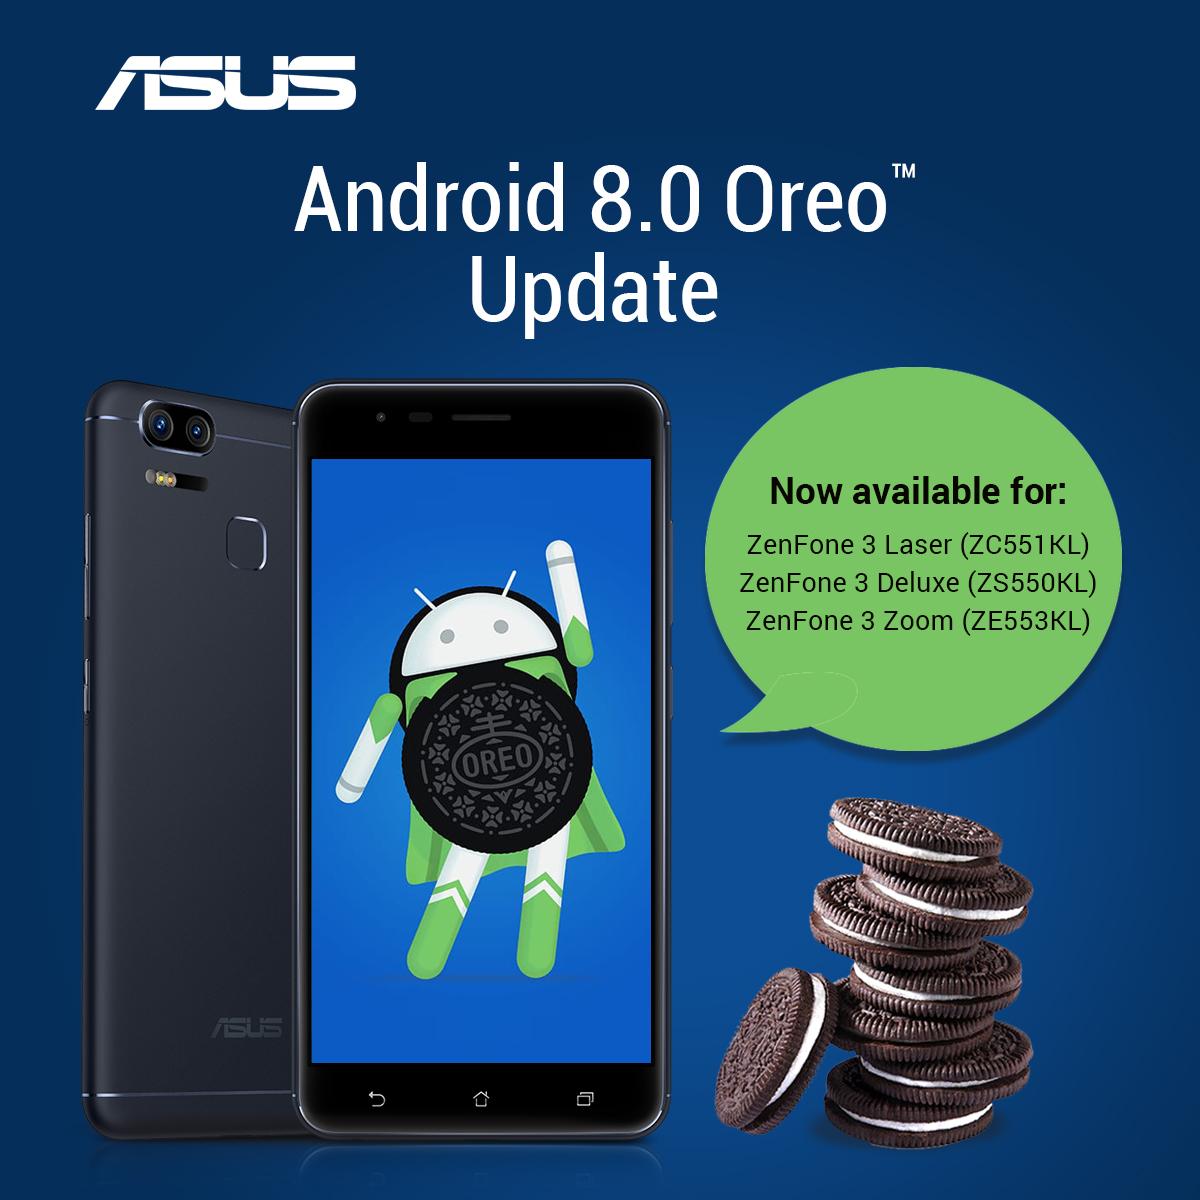 ASUS這次給力!ZenFone 3系列將獲得Android 8.0 Oreo更新! - TechNave 中文版